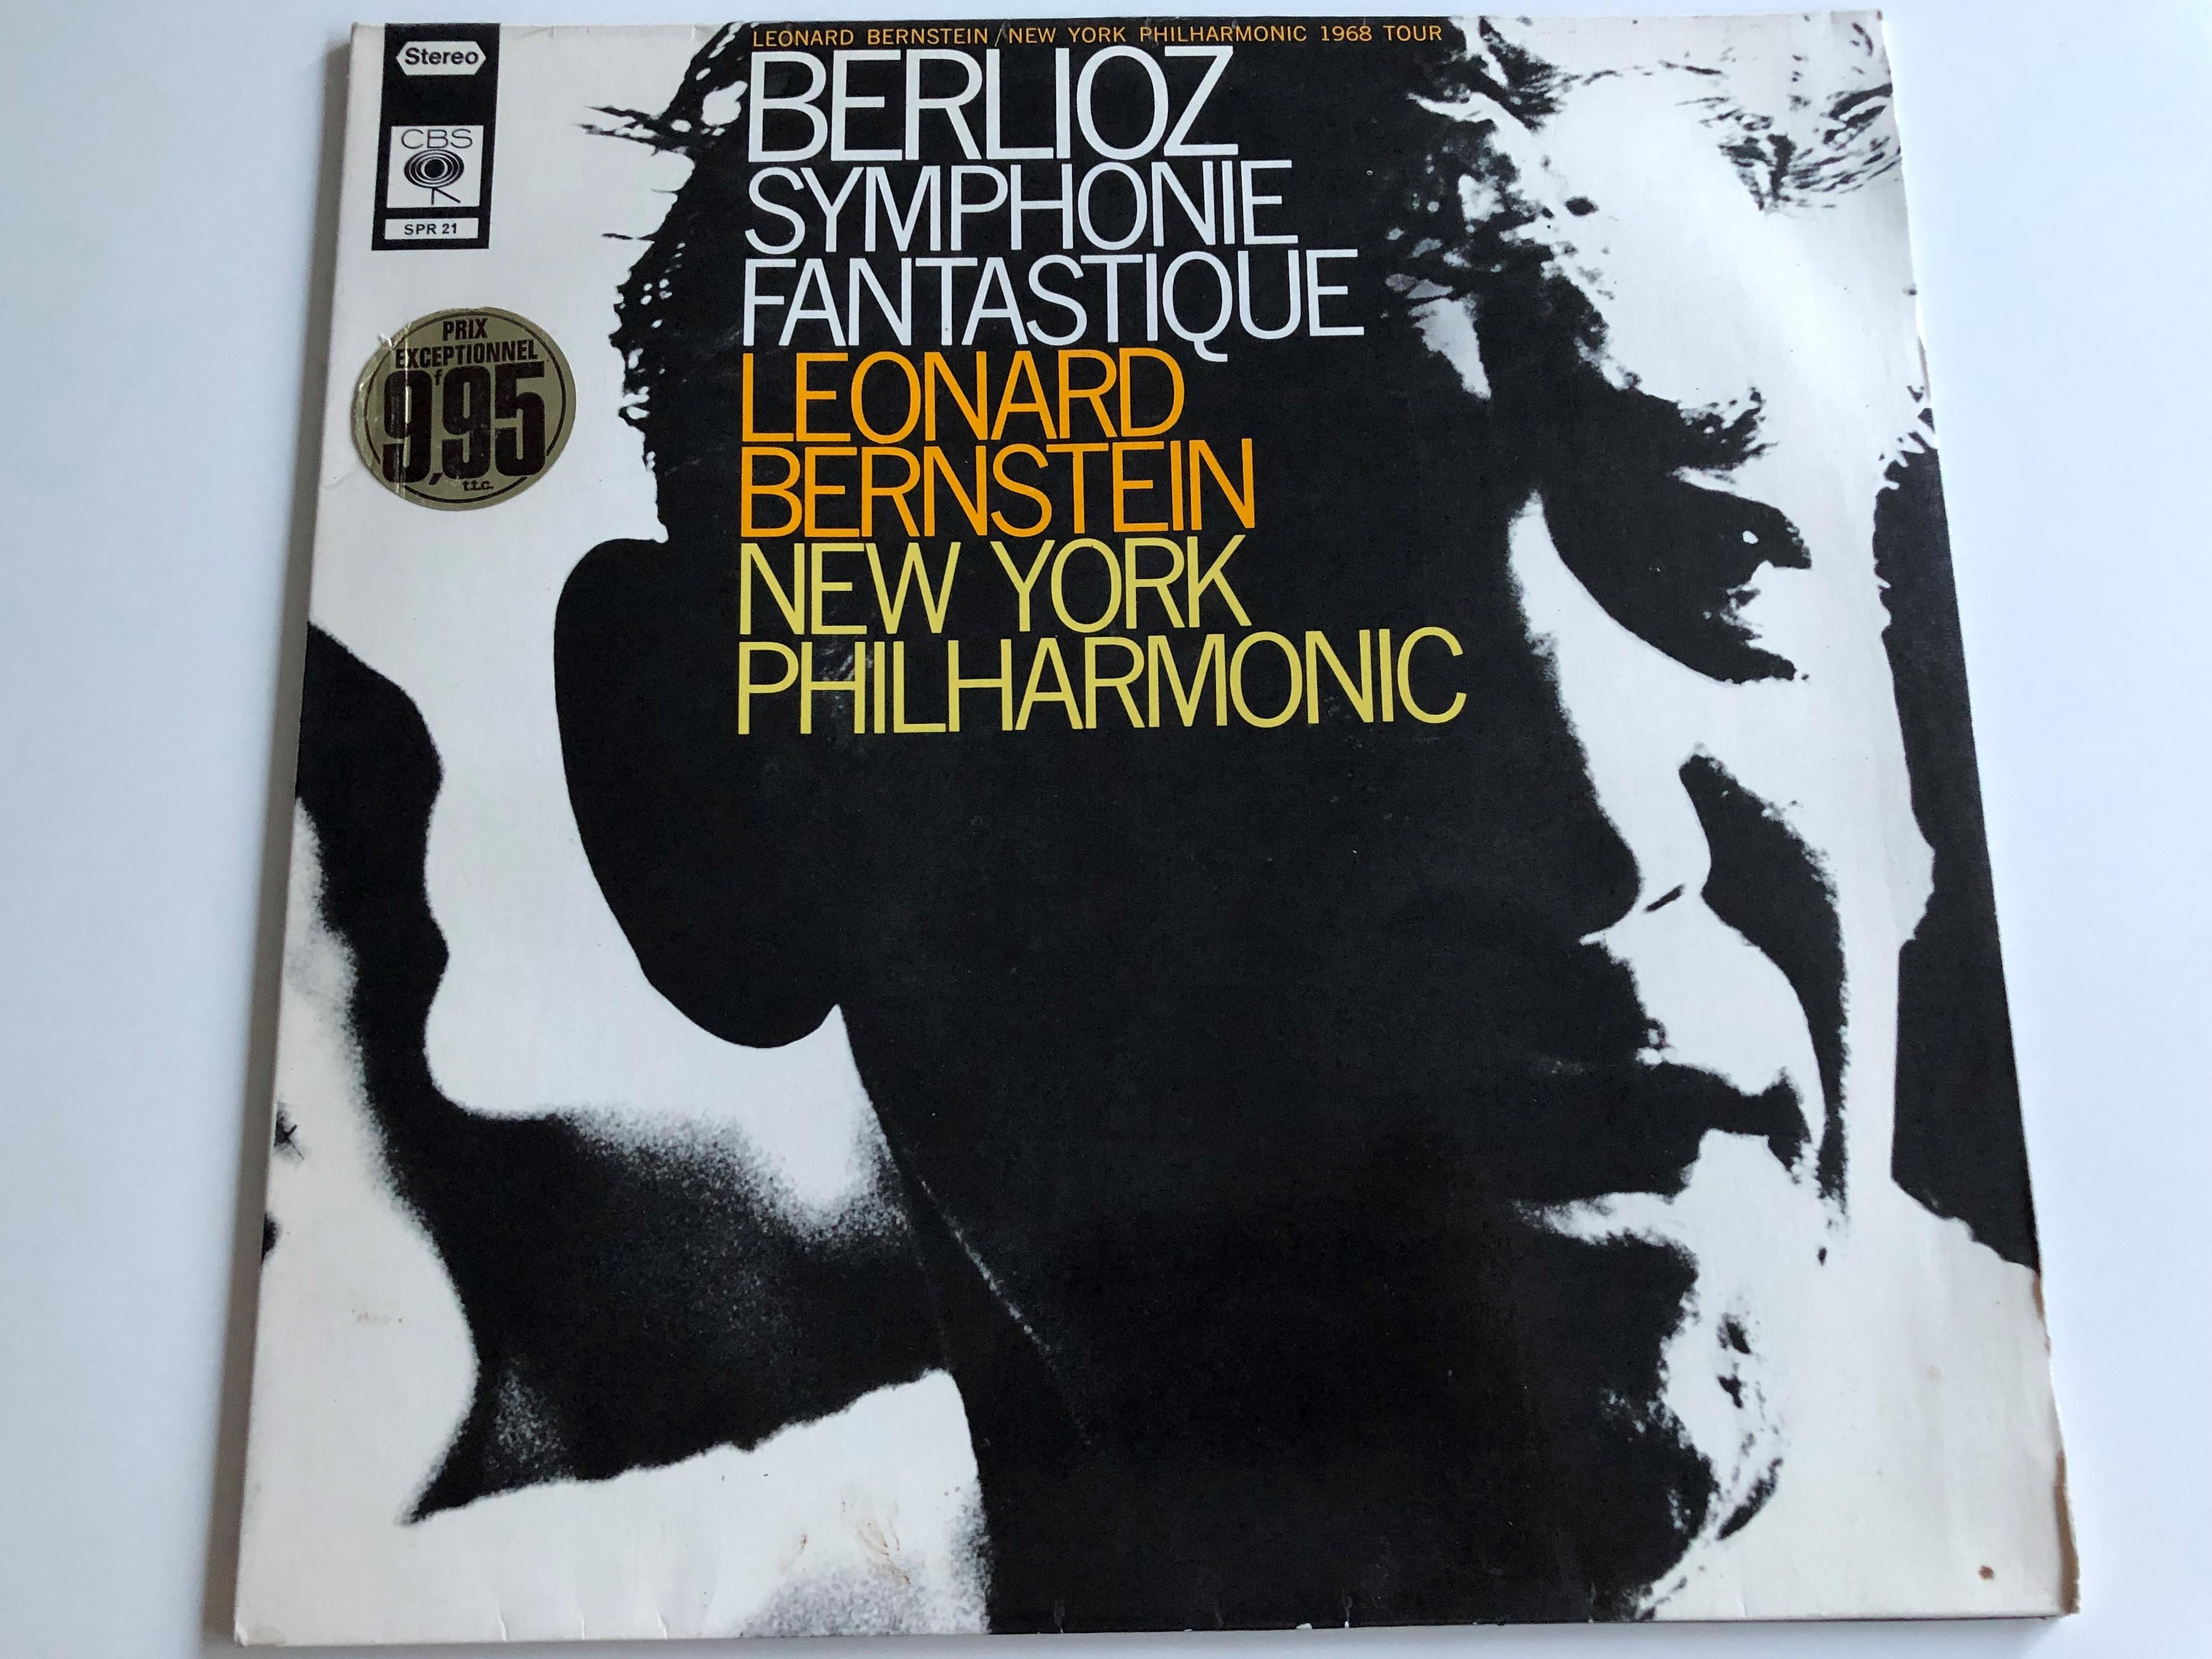 berlioz-symphonie-fantastique-leonard-bernstein-new-york-philharmonic-cbs-lp-stereo-spr-21-2-.jpg